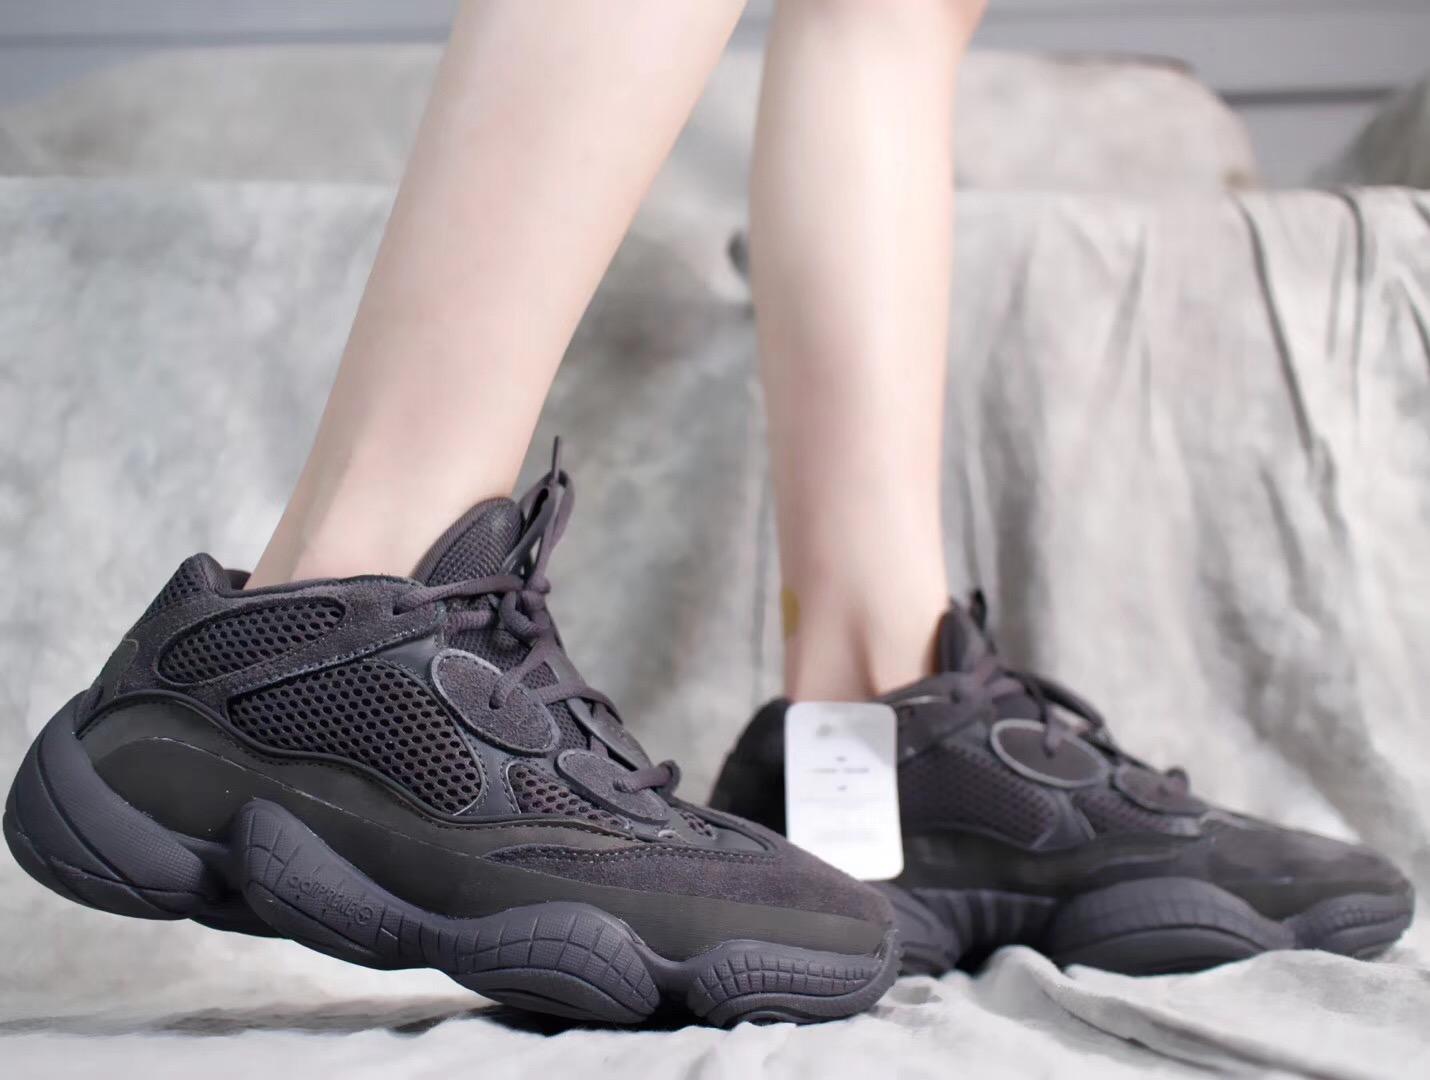 Giày Adidas Yeezy Boost 500 full đen